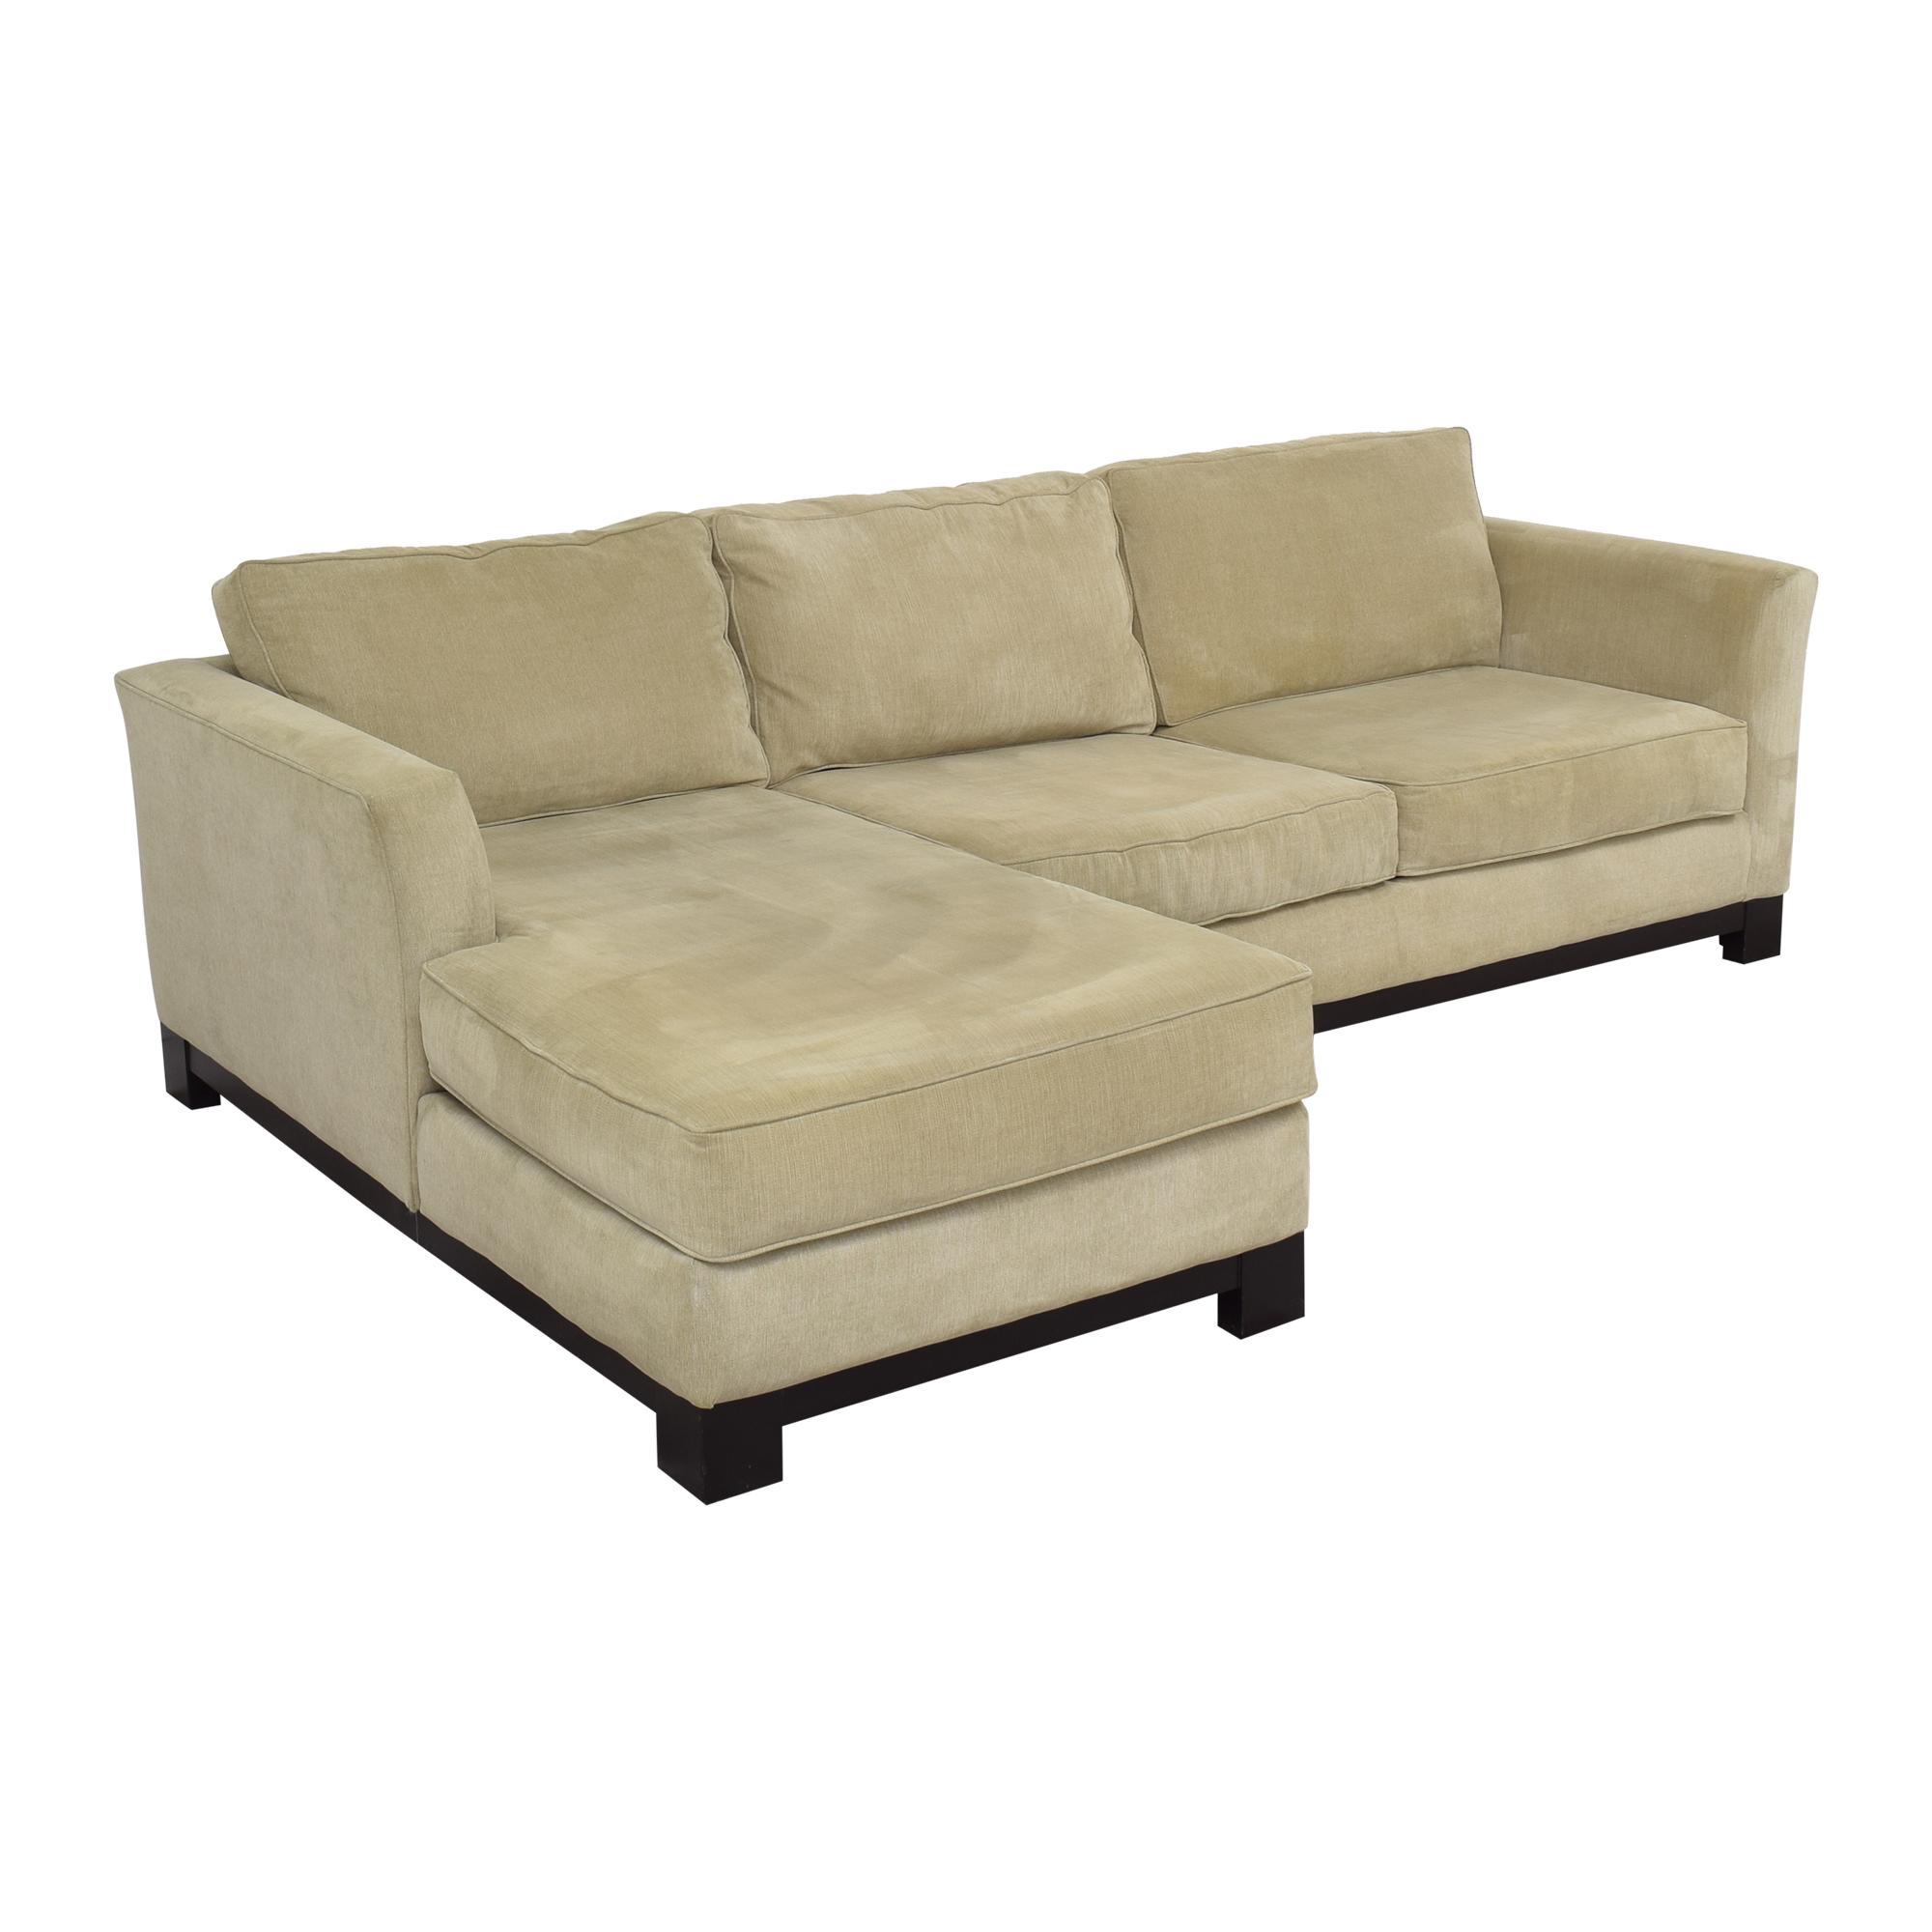 shop Macy's Elliot II Two Piece Chaise Sectional Sofa Macy's Sofas